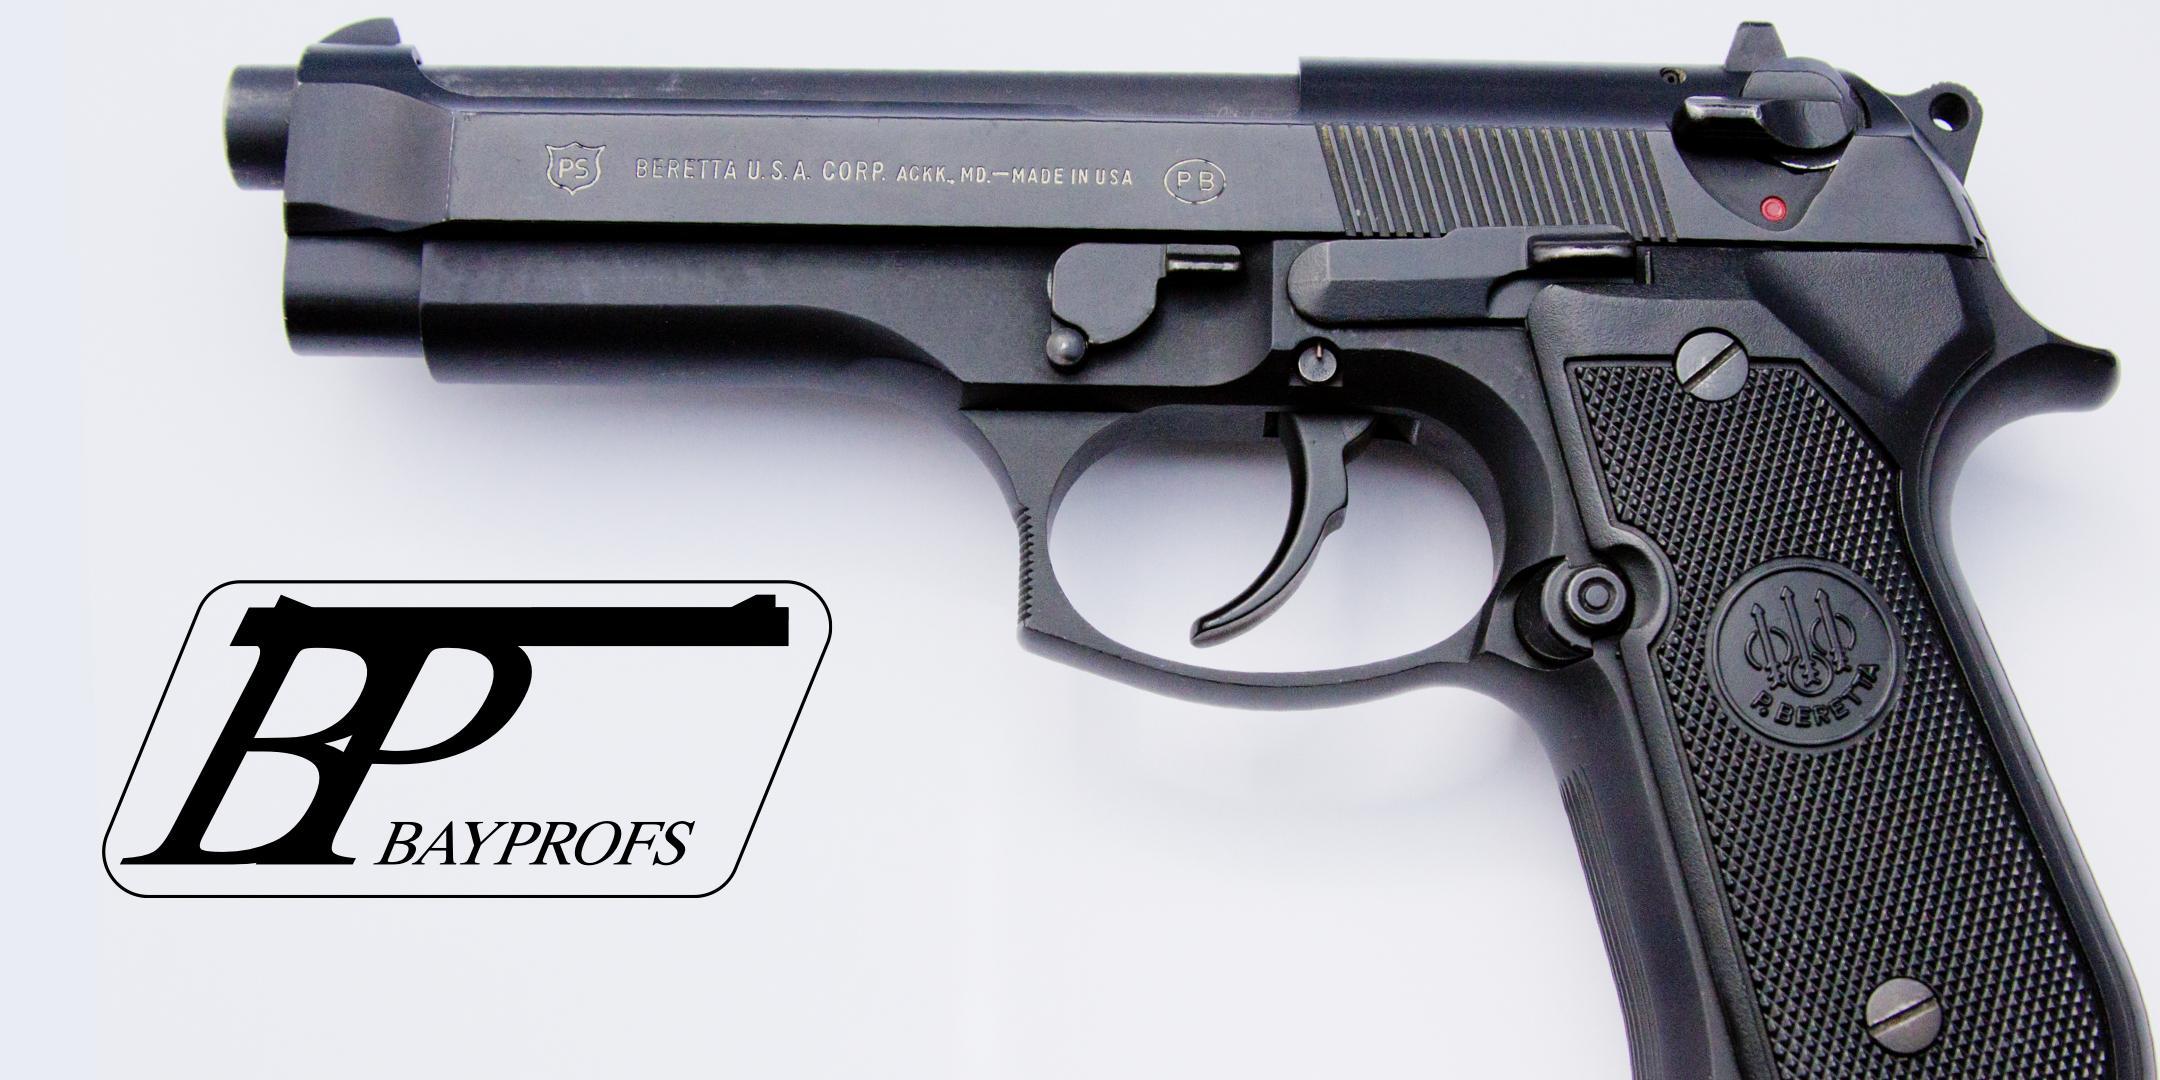 Bayprofs NRA Basics of Pistol Shooting Class